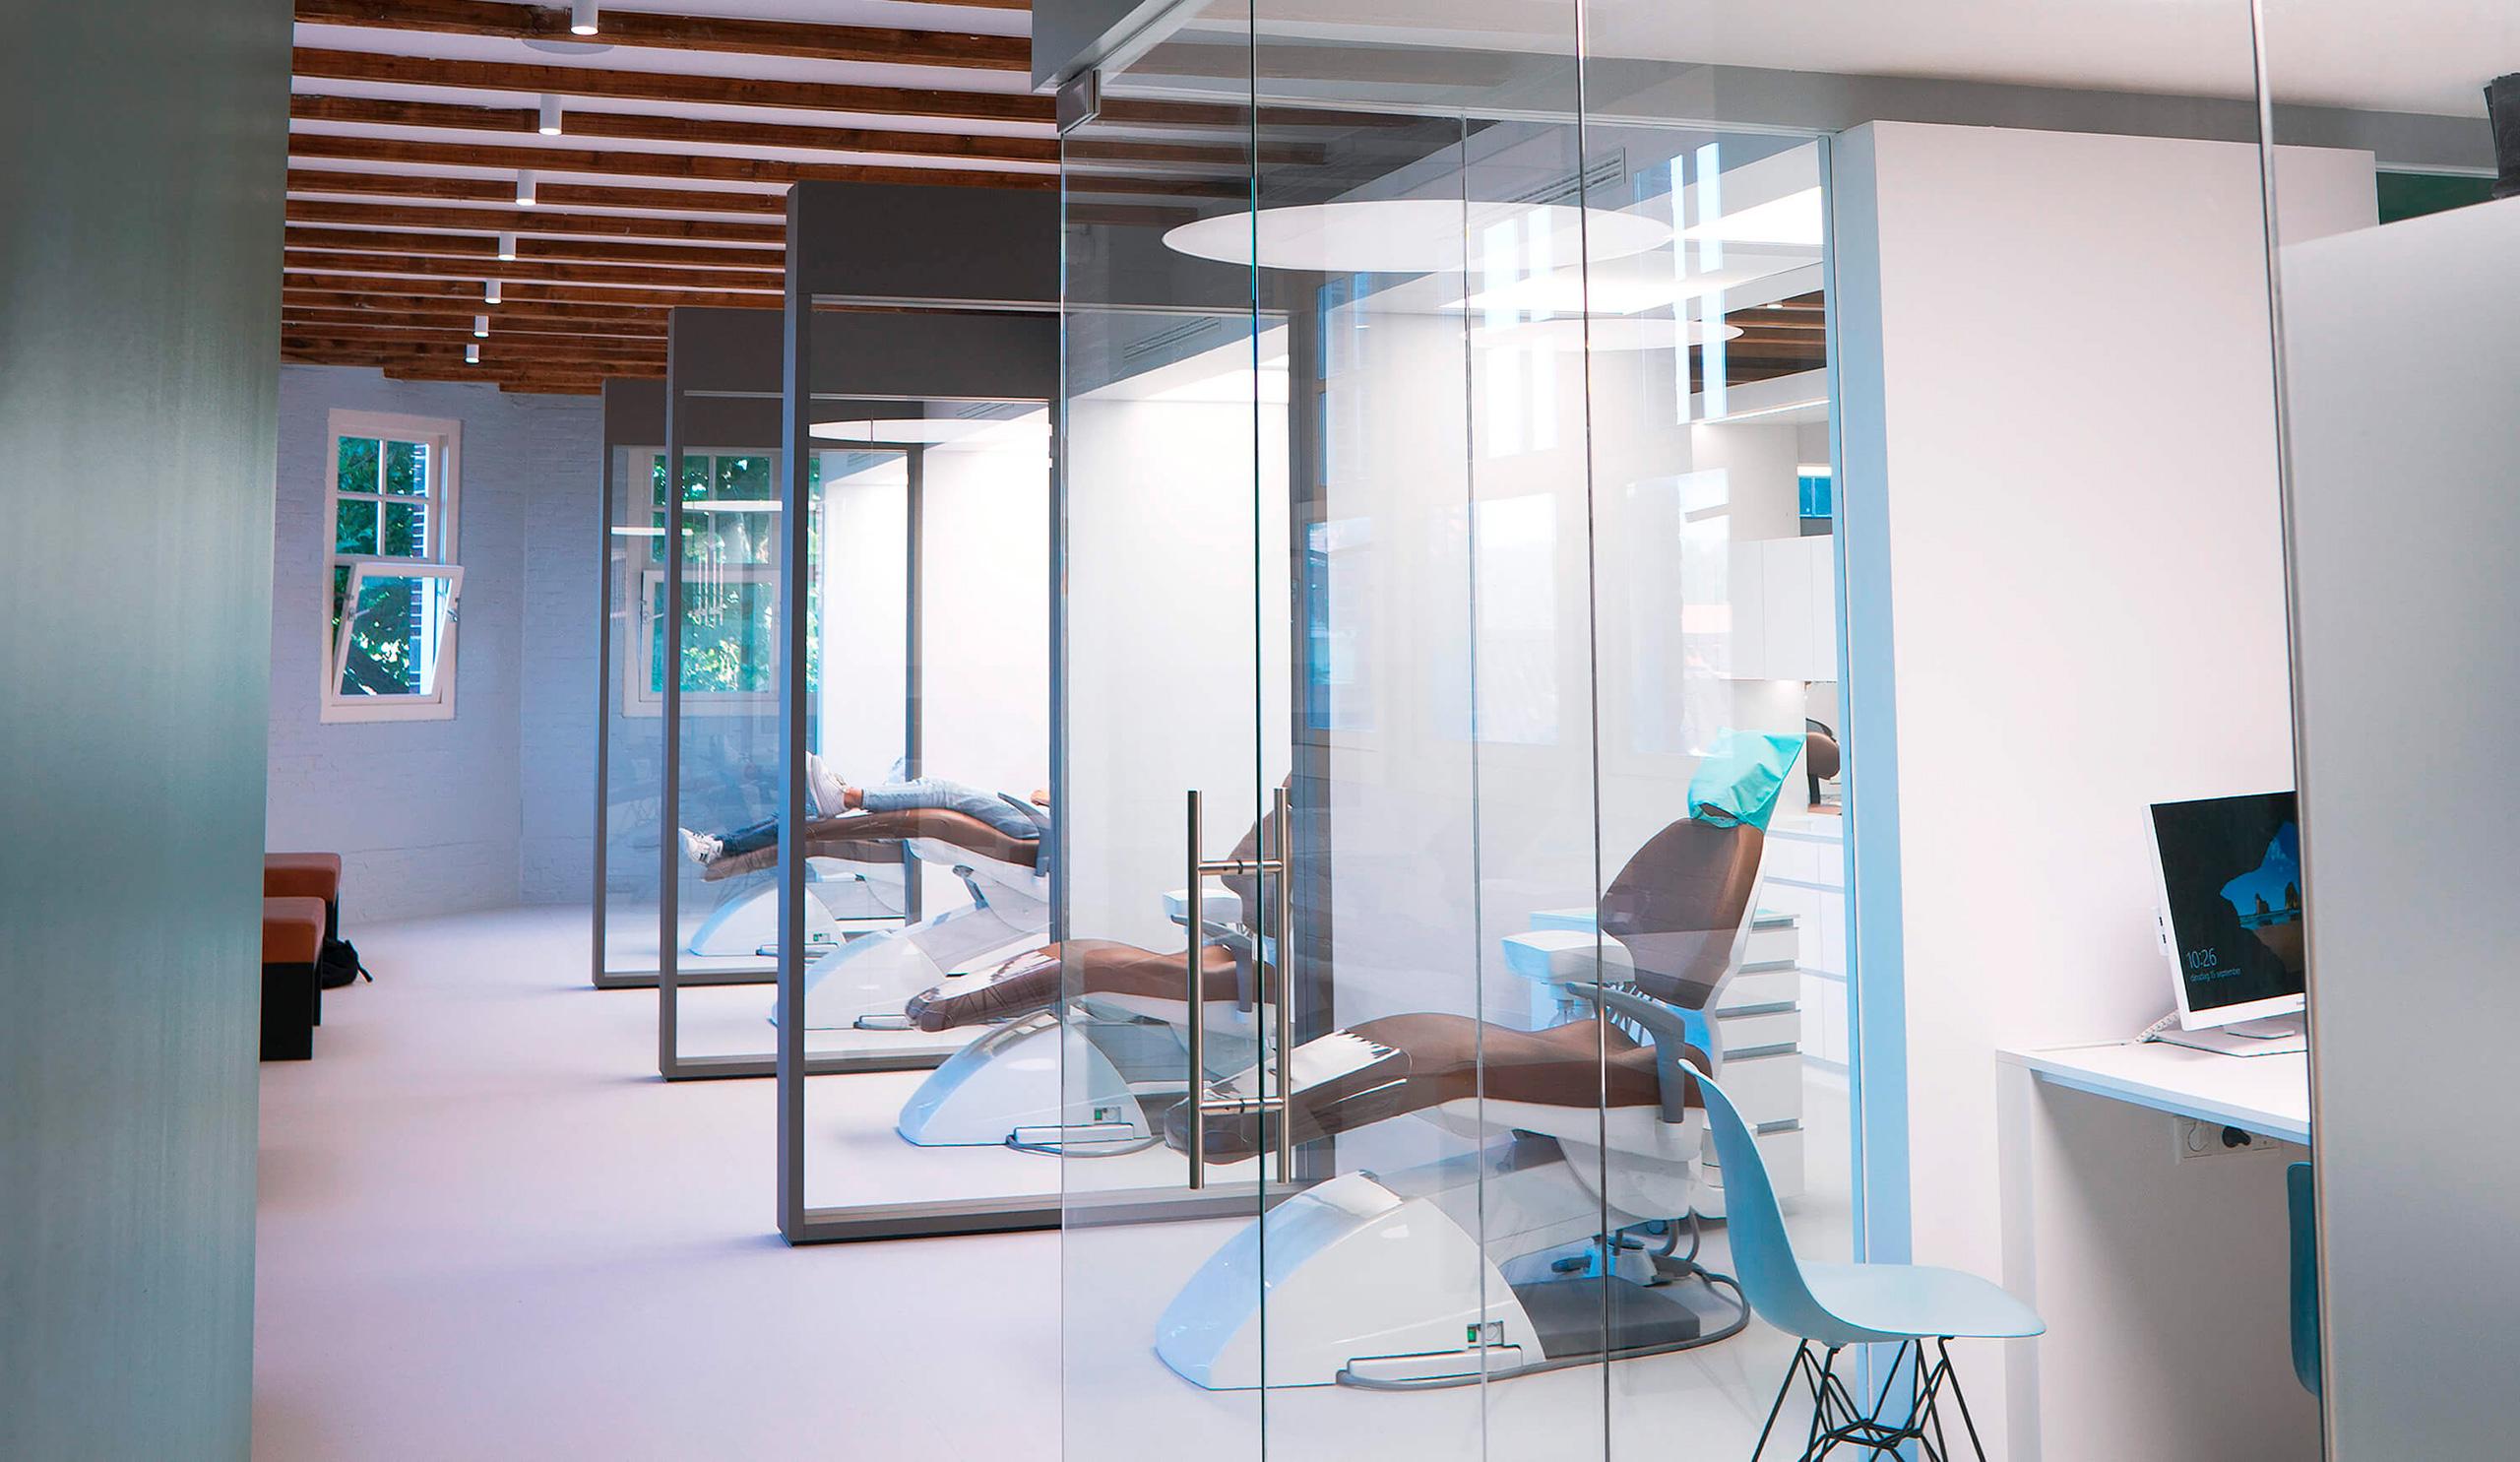 oadz-beugeltandarts-zaandam-behandelkamer